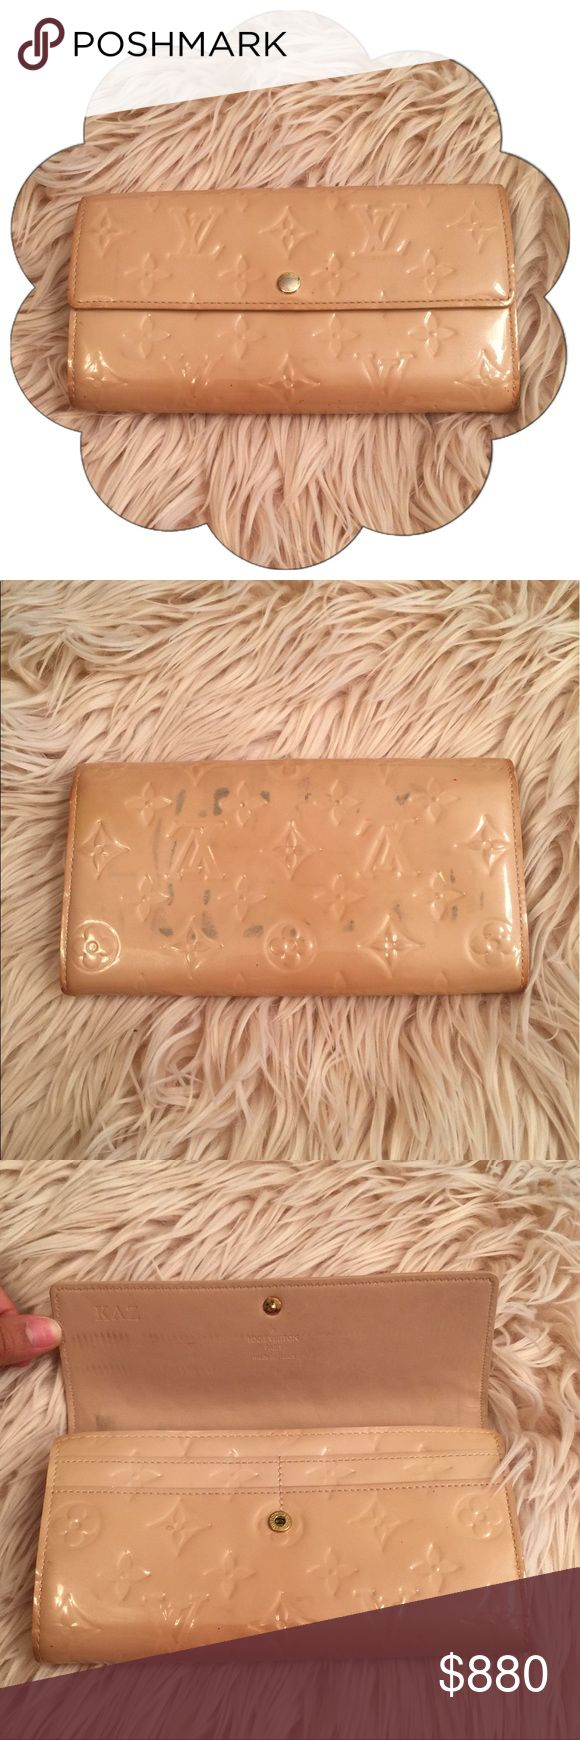 Authentic Louis Vuitton Vernis Wallet 100% Authentic Louis Vuitton : Pre-loved : Date Code TS0110 : Fully functional Louis Vuitton Bags Wallets